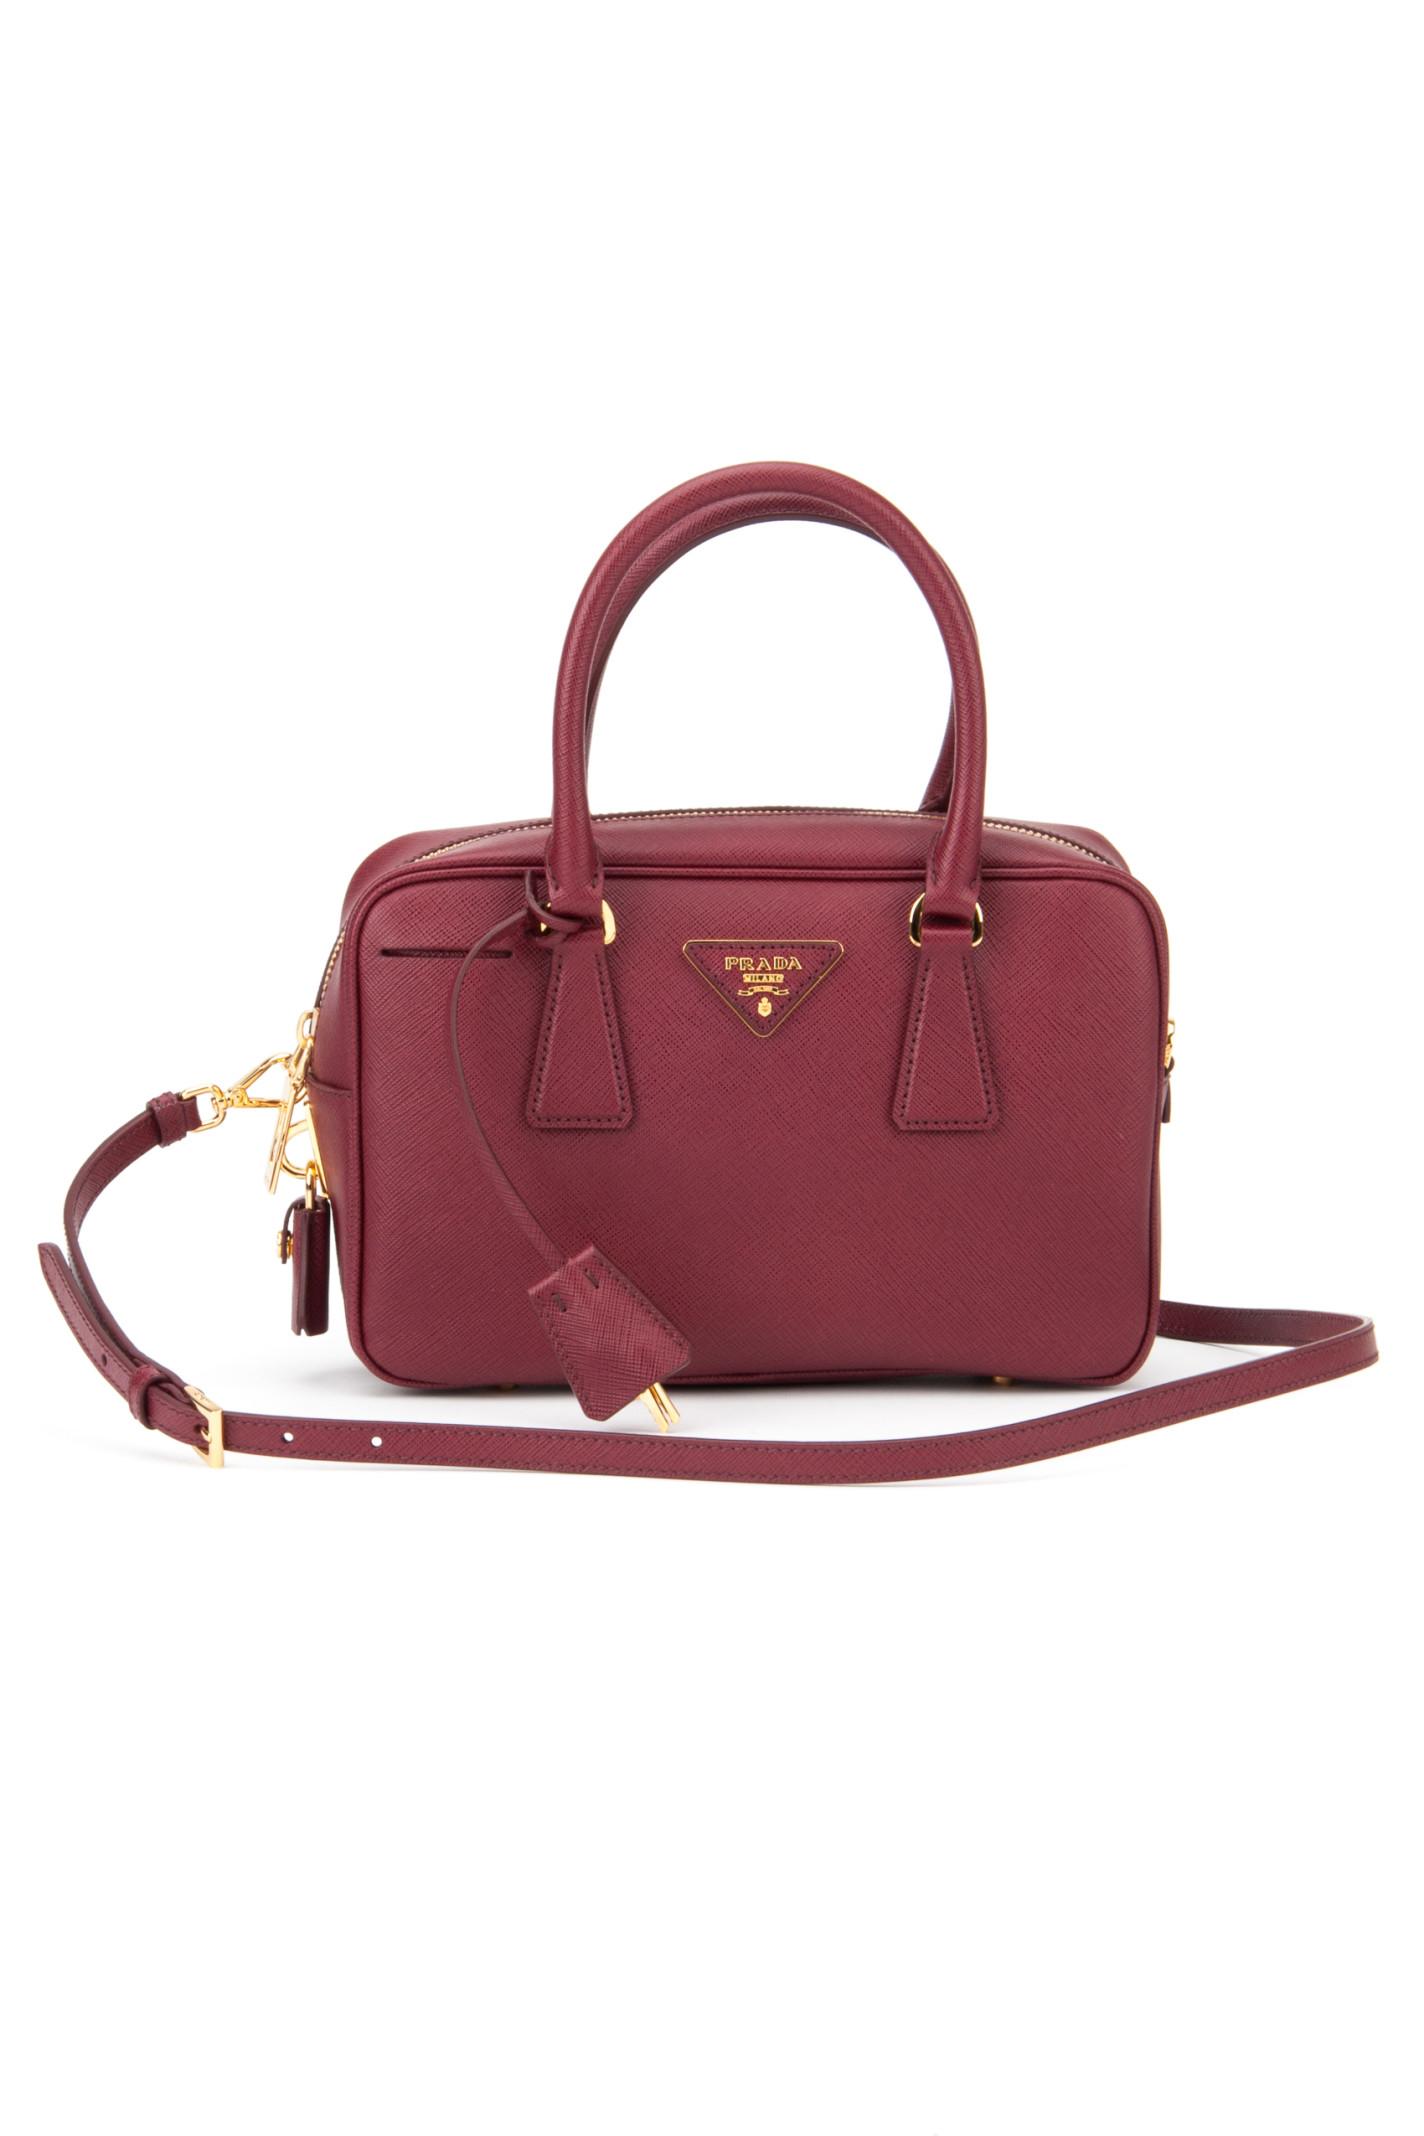 Prada Saffiano Lux Bowling Bag in Red (CERISE) | Lyst